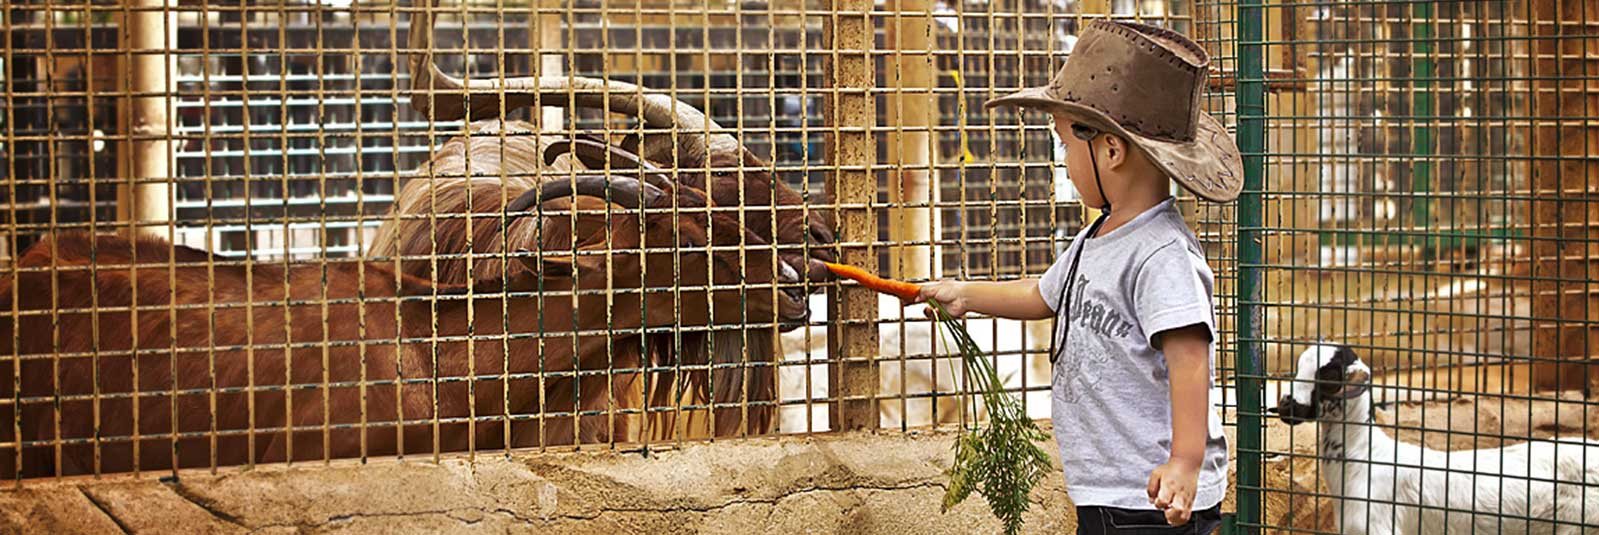 Abu-Dhabi-Emirates-Zoo